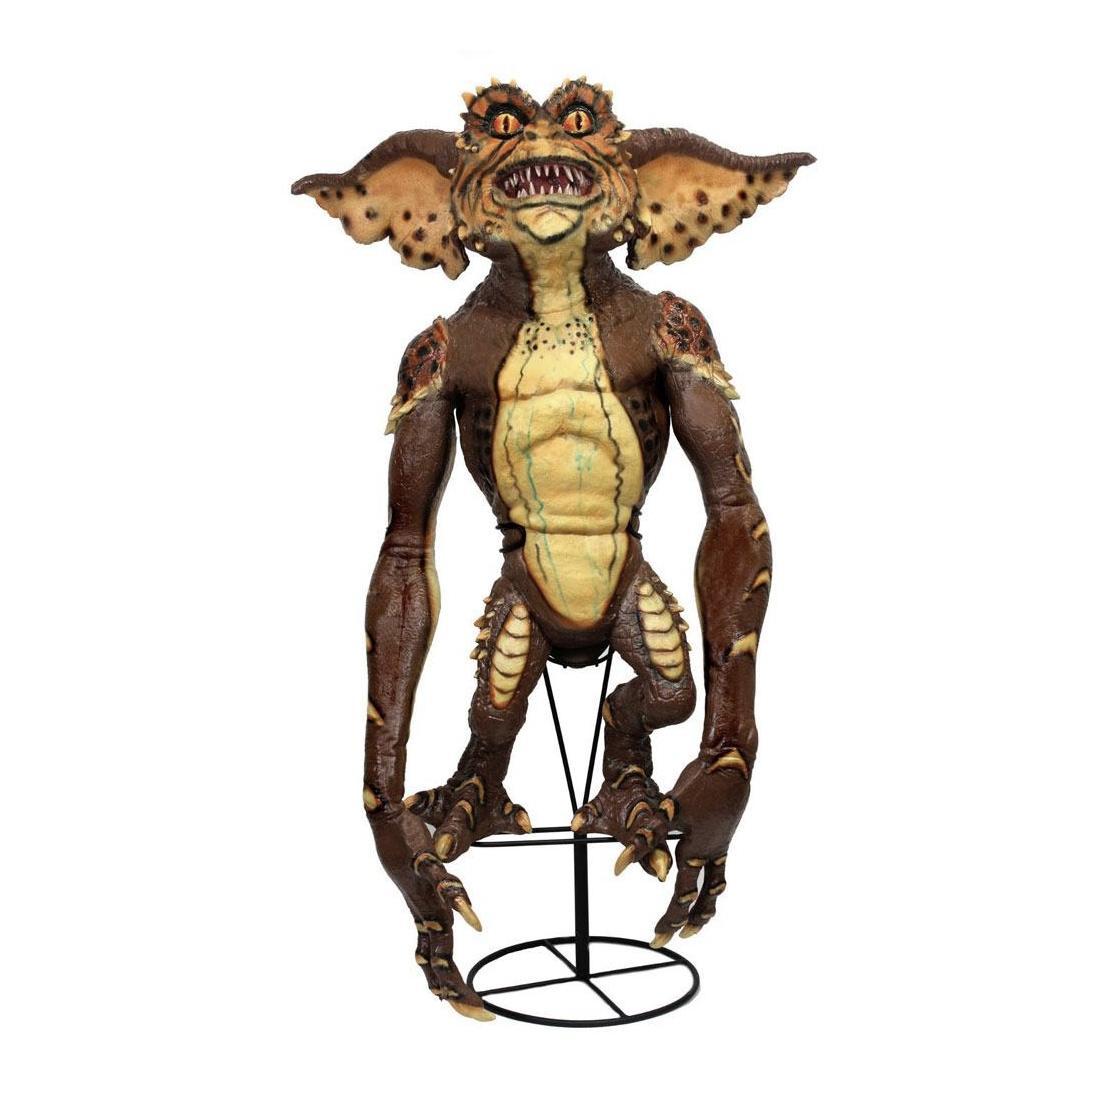 Poupee gremlin stunt puppet 75cm 1